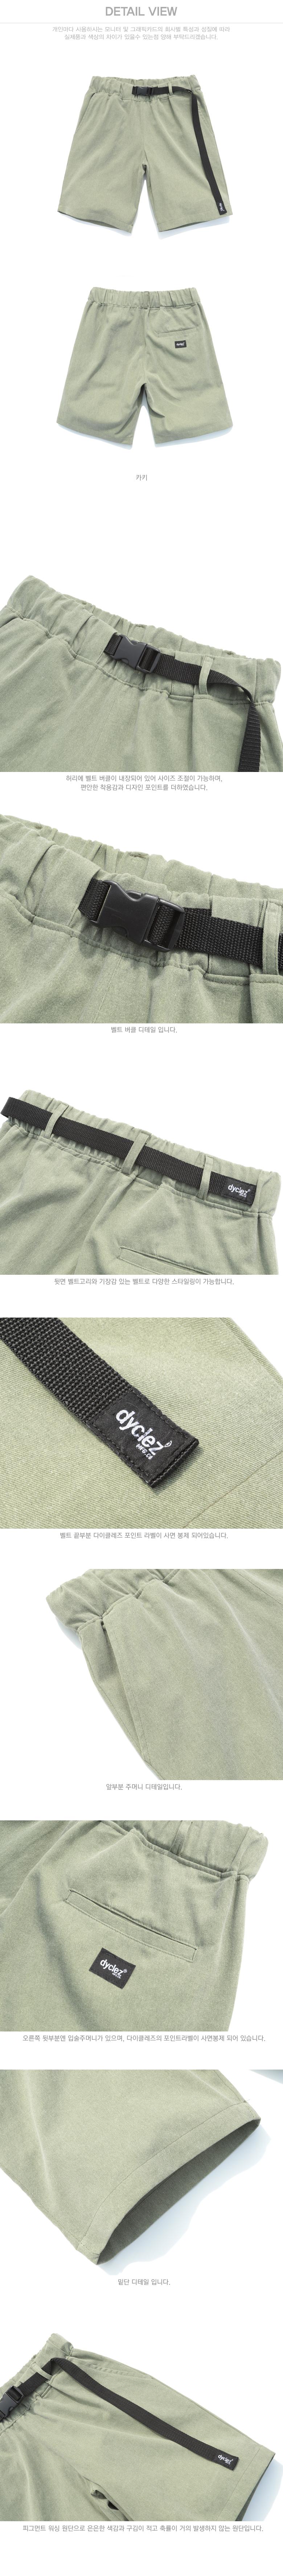 20180404_dy_pigment_short_pants_detail_khaki_kj.jpg